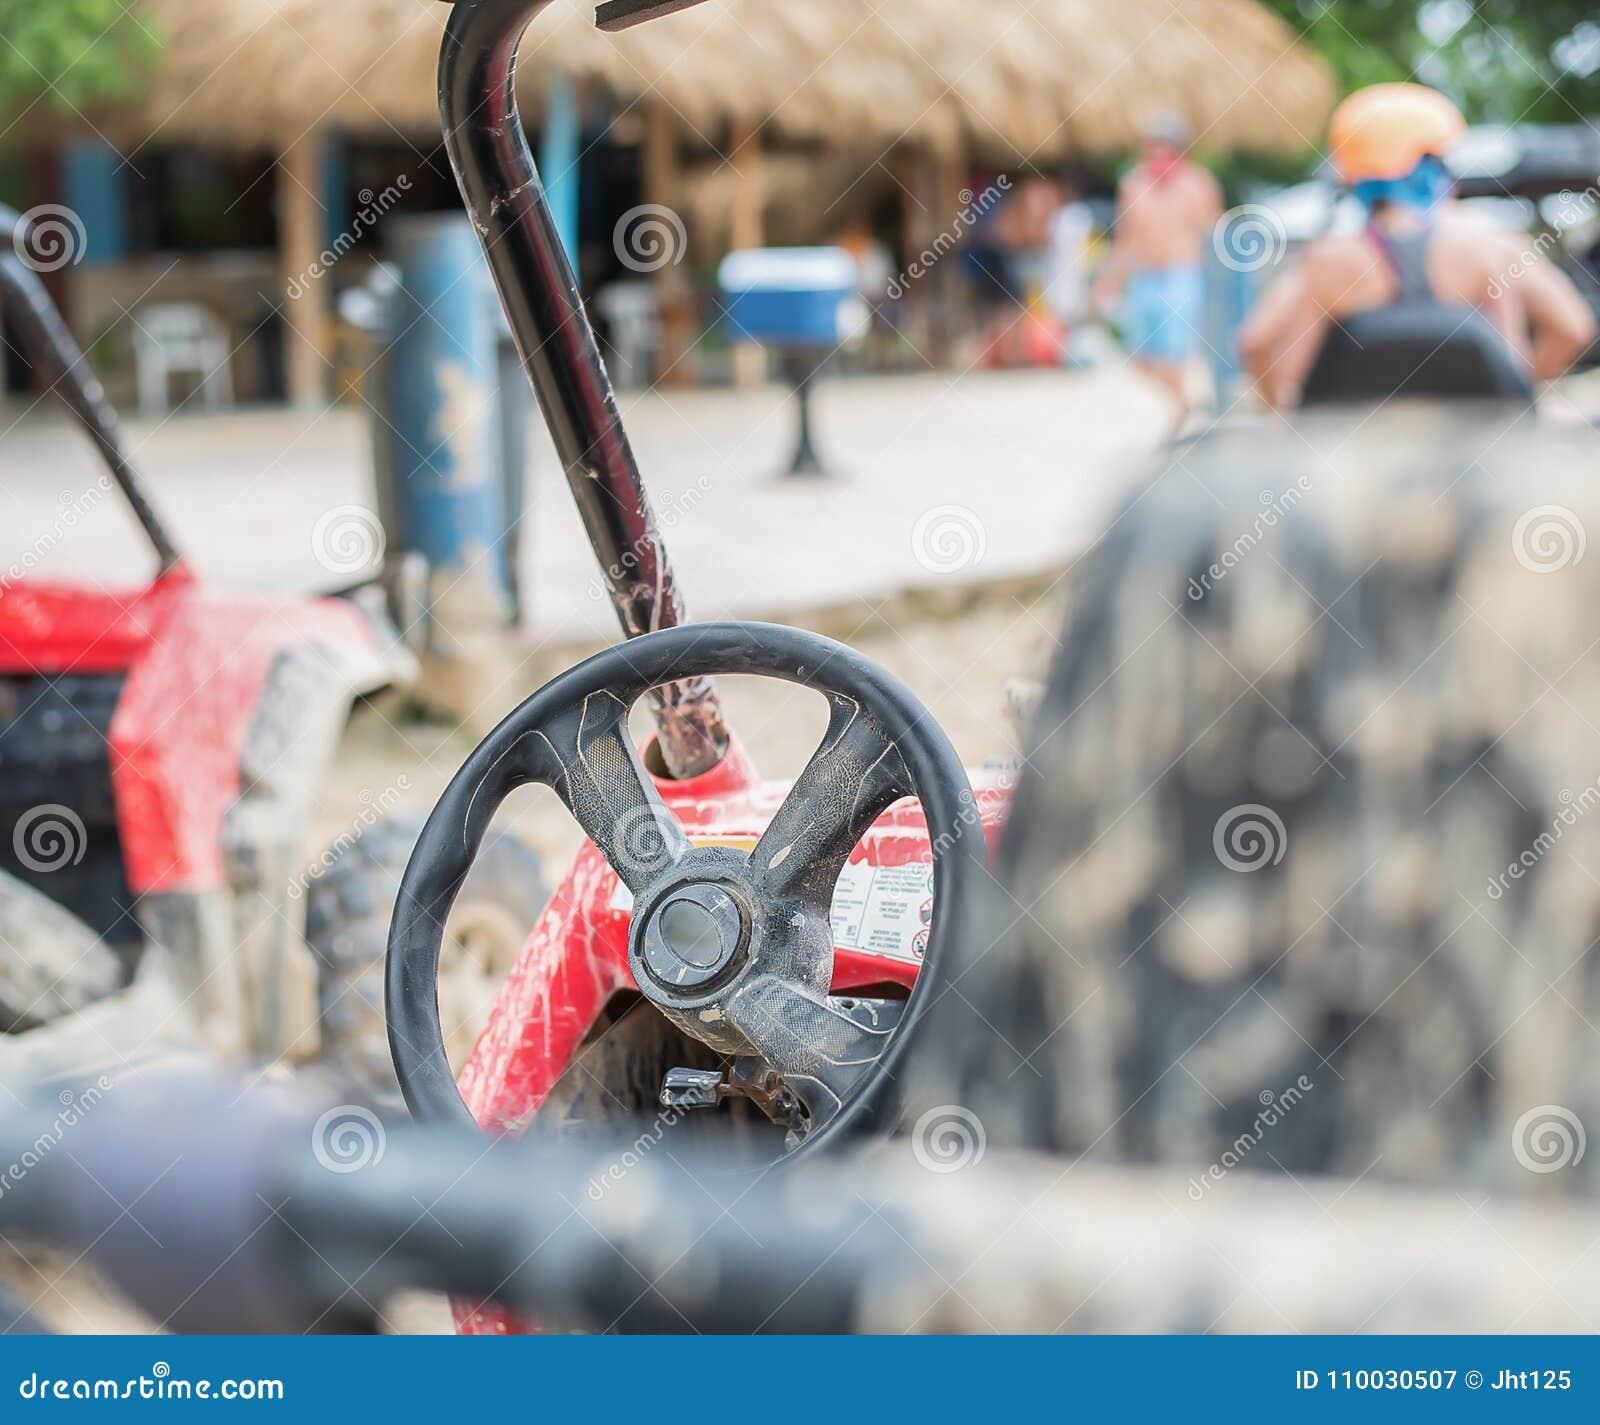 Vuilfietsen en ritten in modder in Dominicaanse Republiek